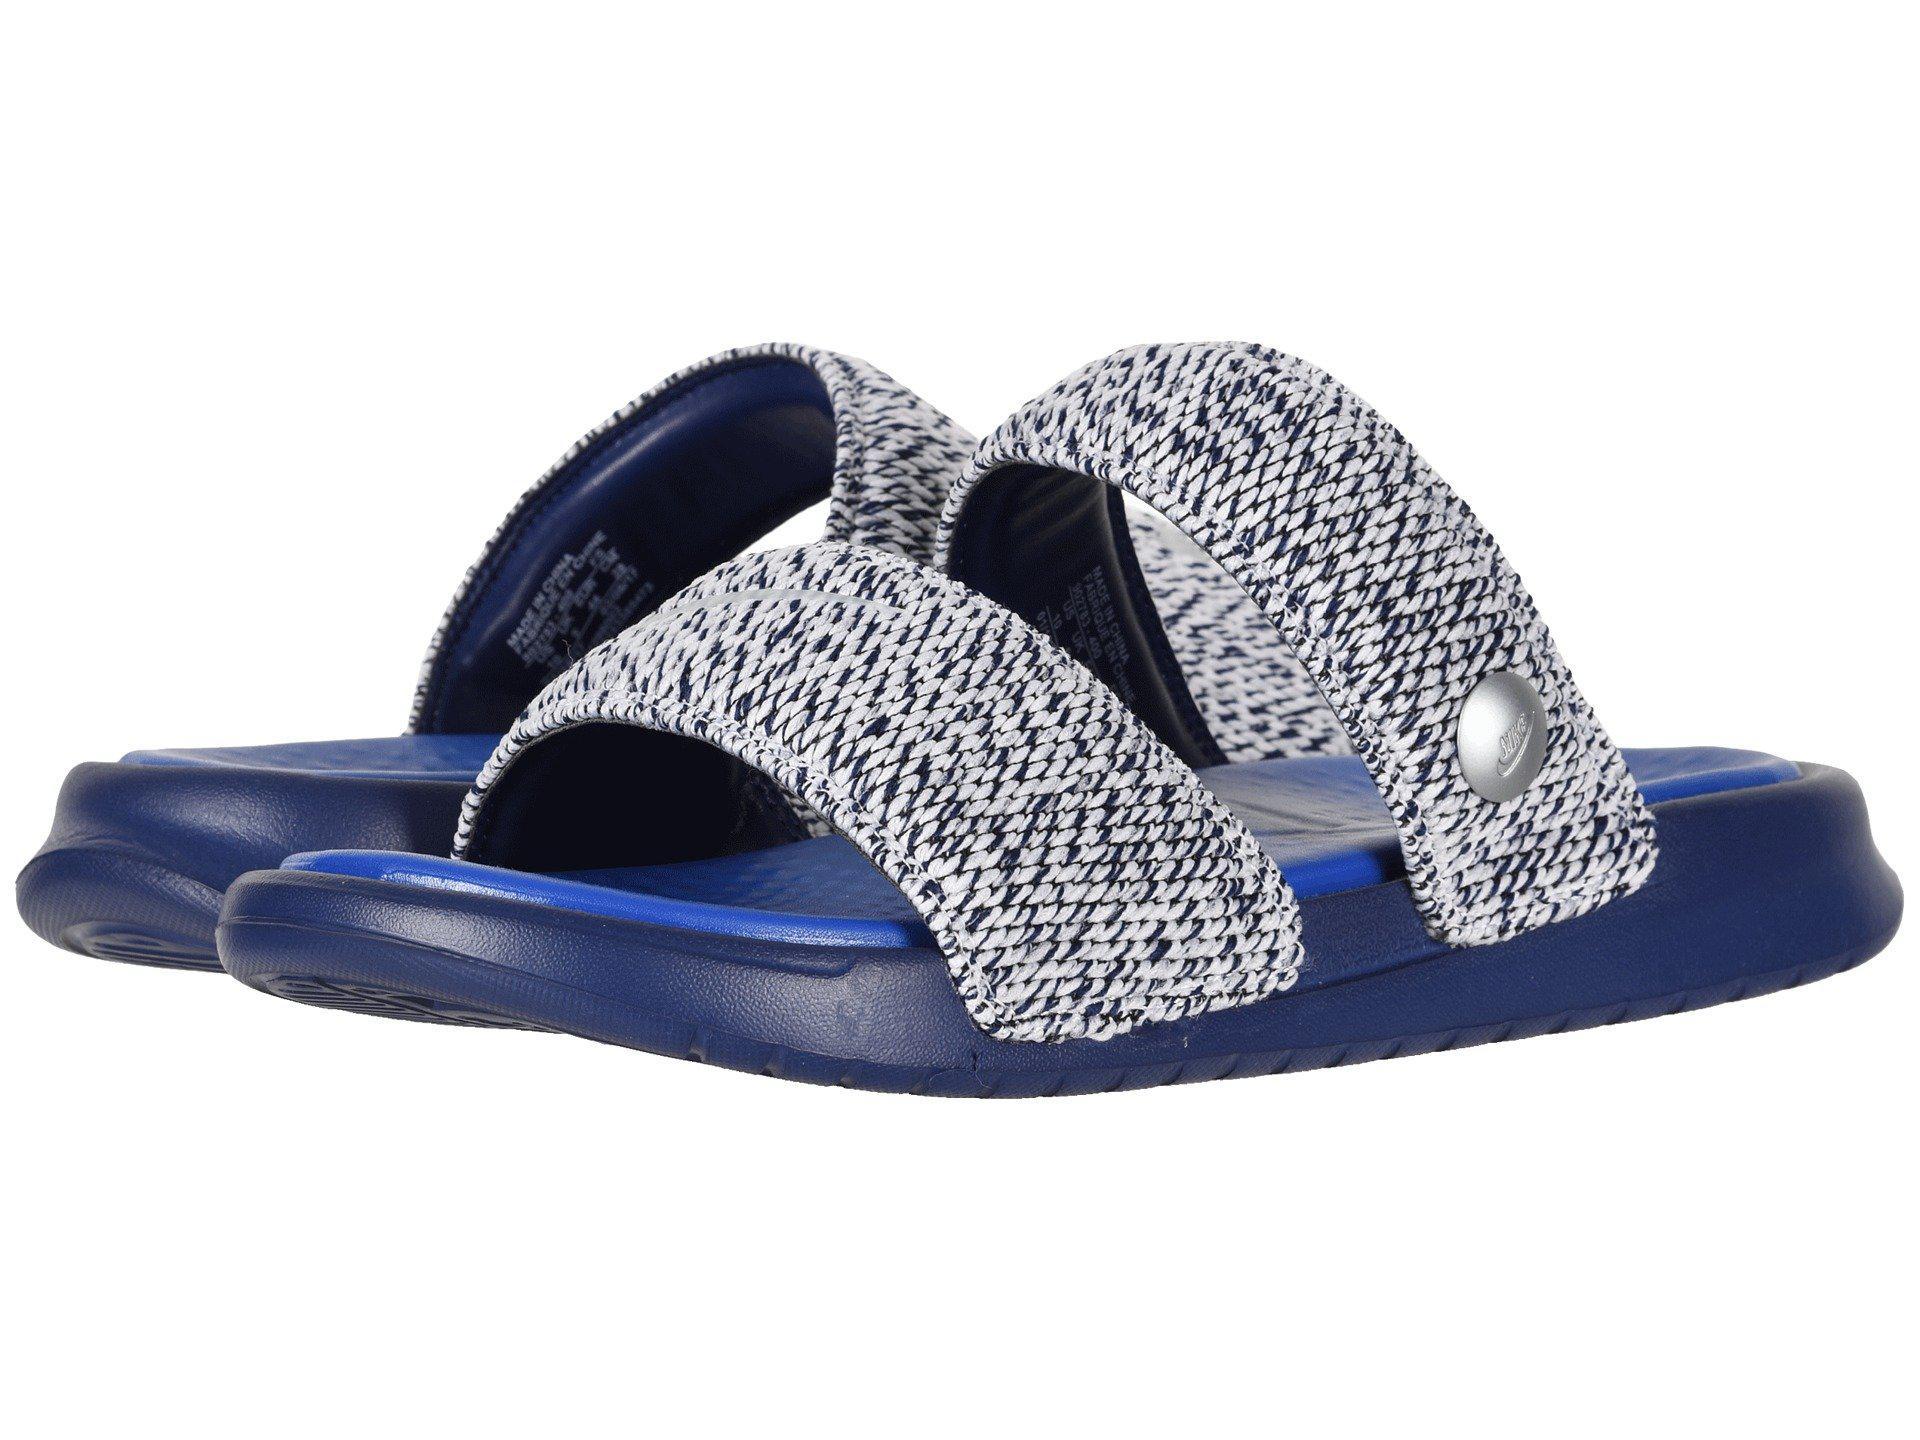 ee583908d195 Lyst - Nike Lab X Pigalle Benassi Duo Ultra Slide (blue) Women s ...